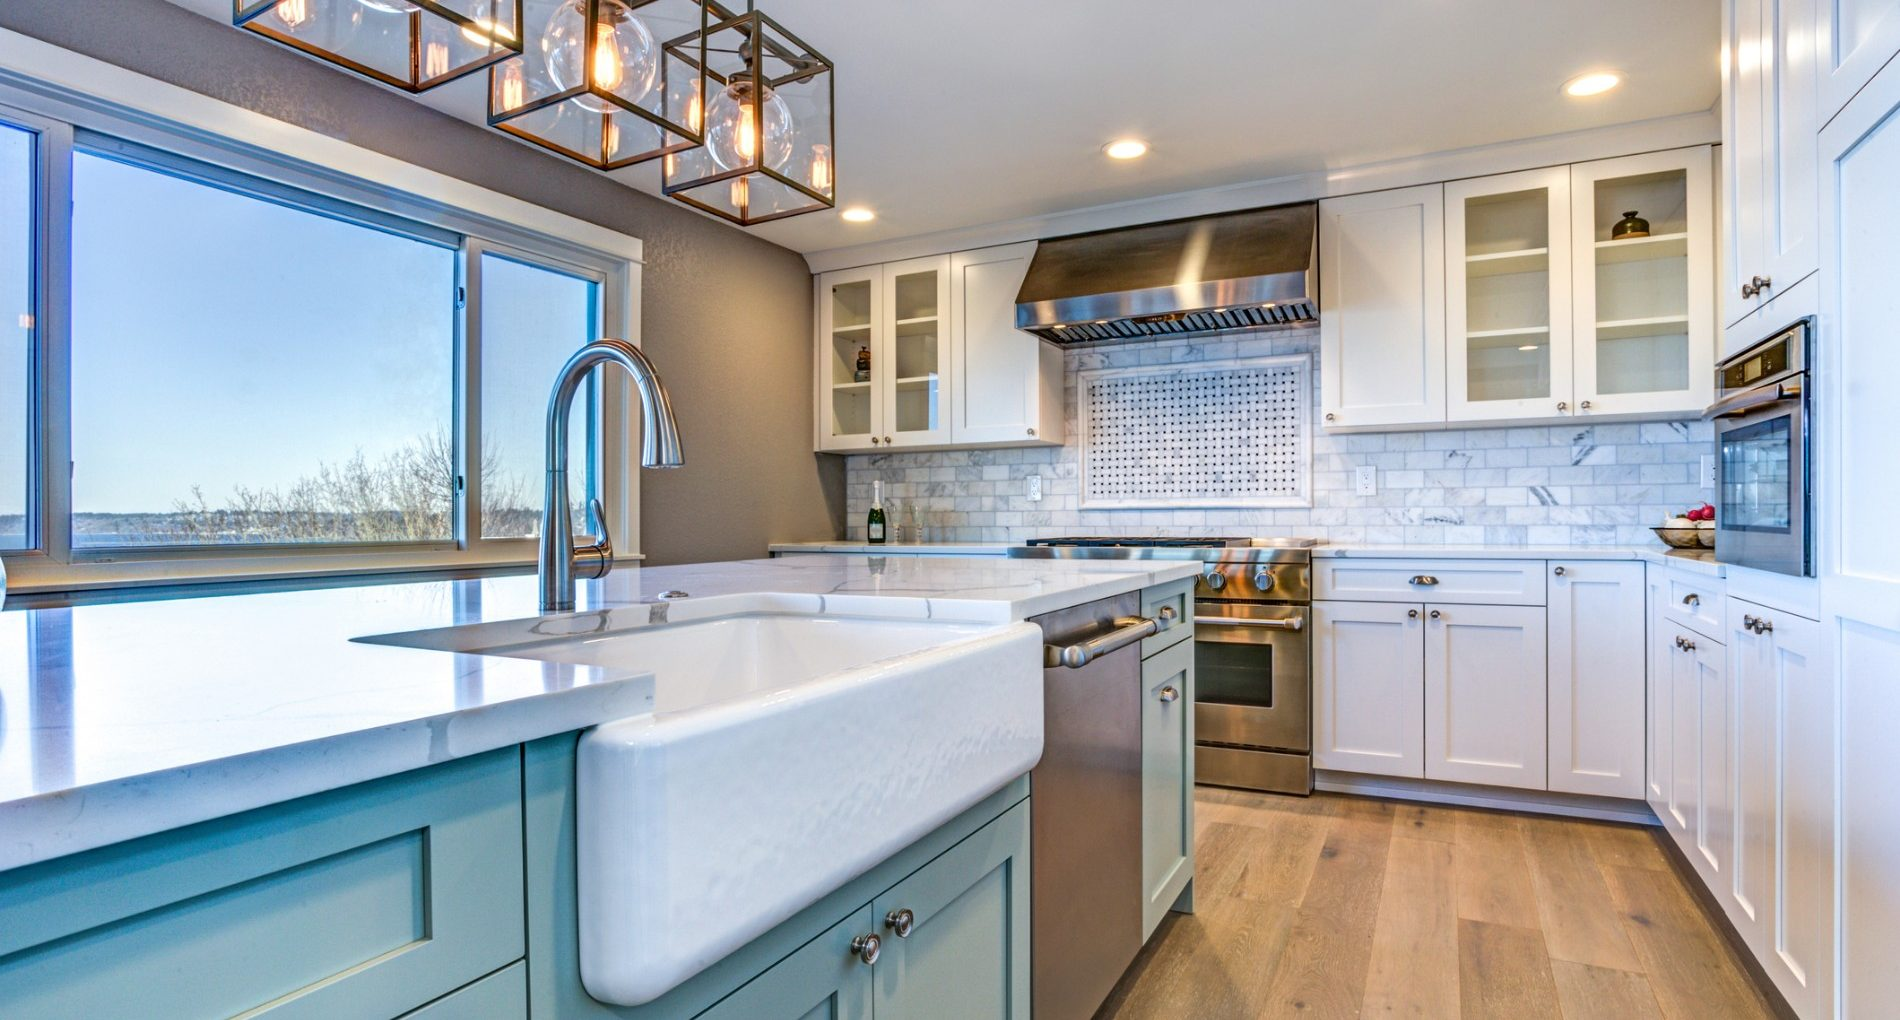 Bringing Blue into Your New Braunfels Kitchen